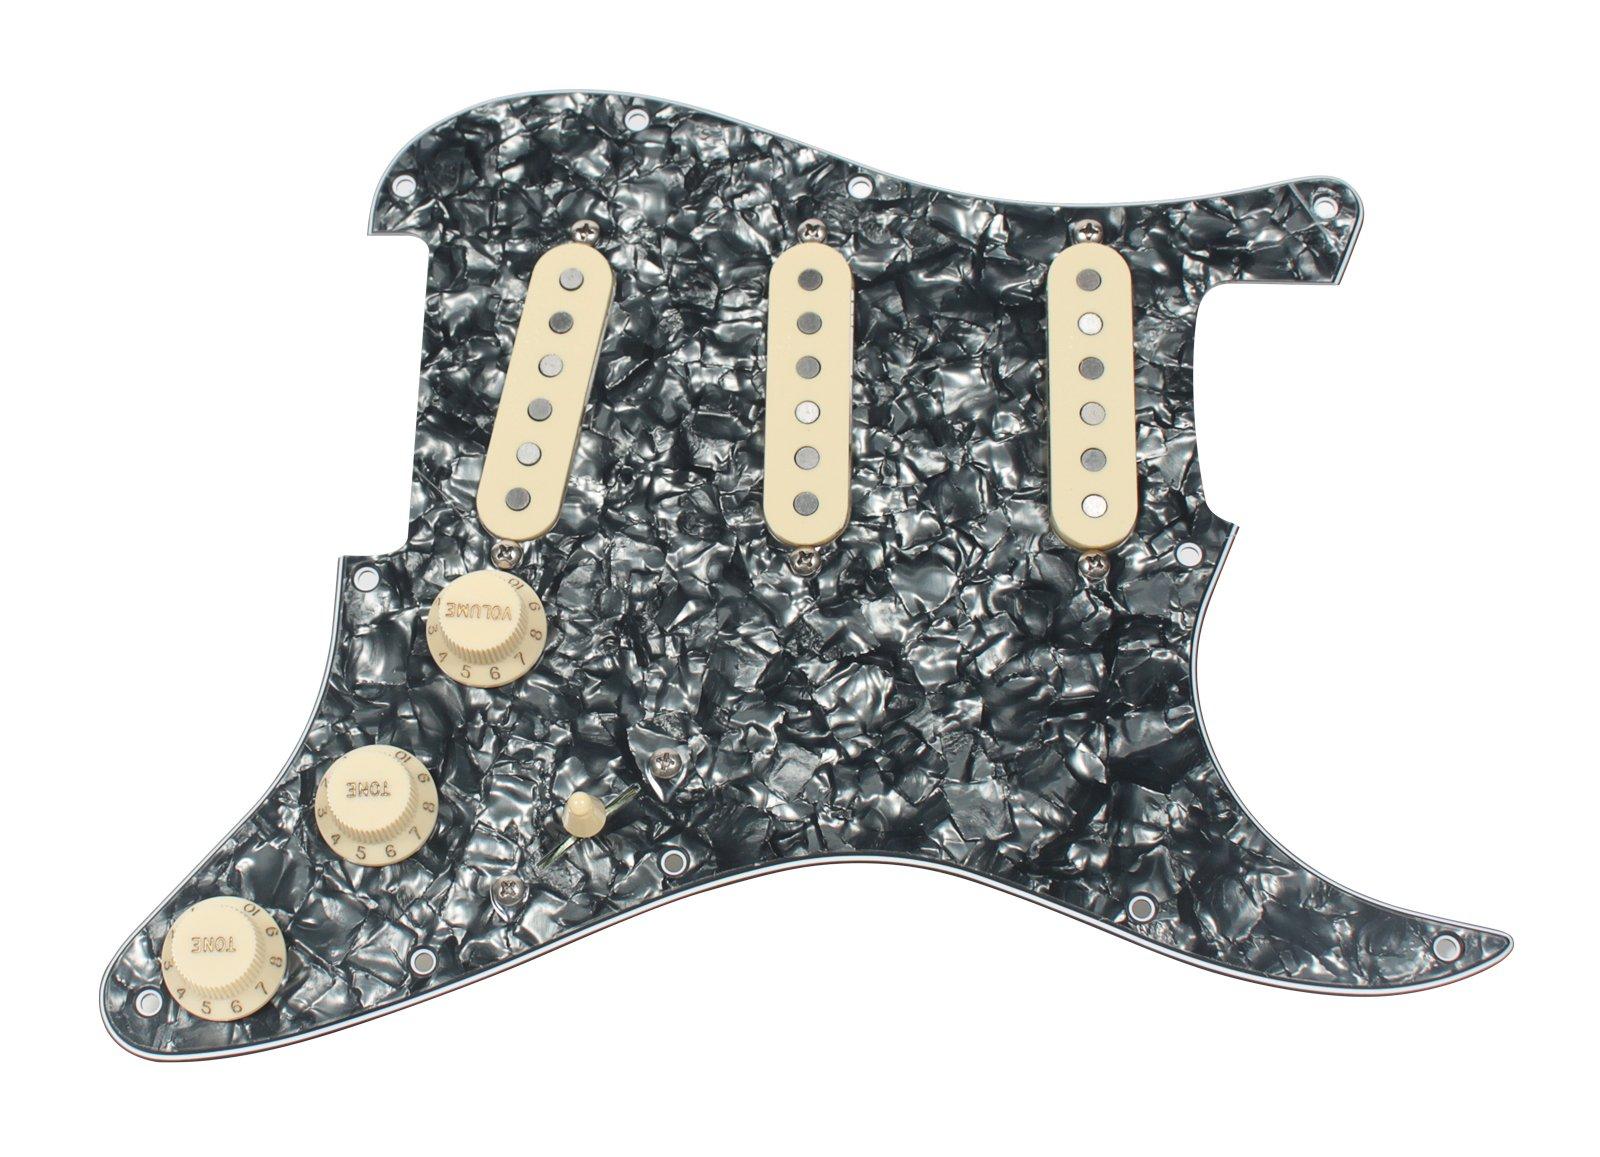 920D Custom Loaded Pickguard Fender Strat Rio Grande Vintage Tall Boy Black Prl